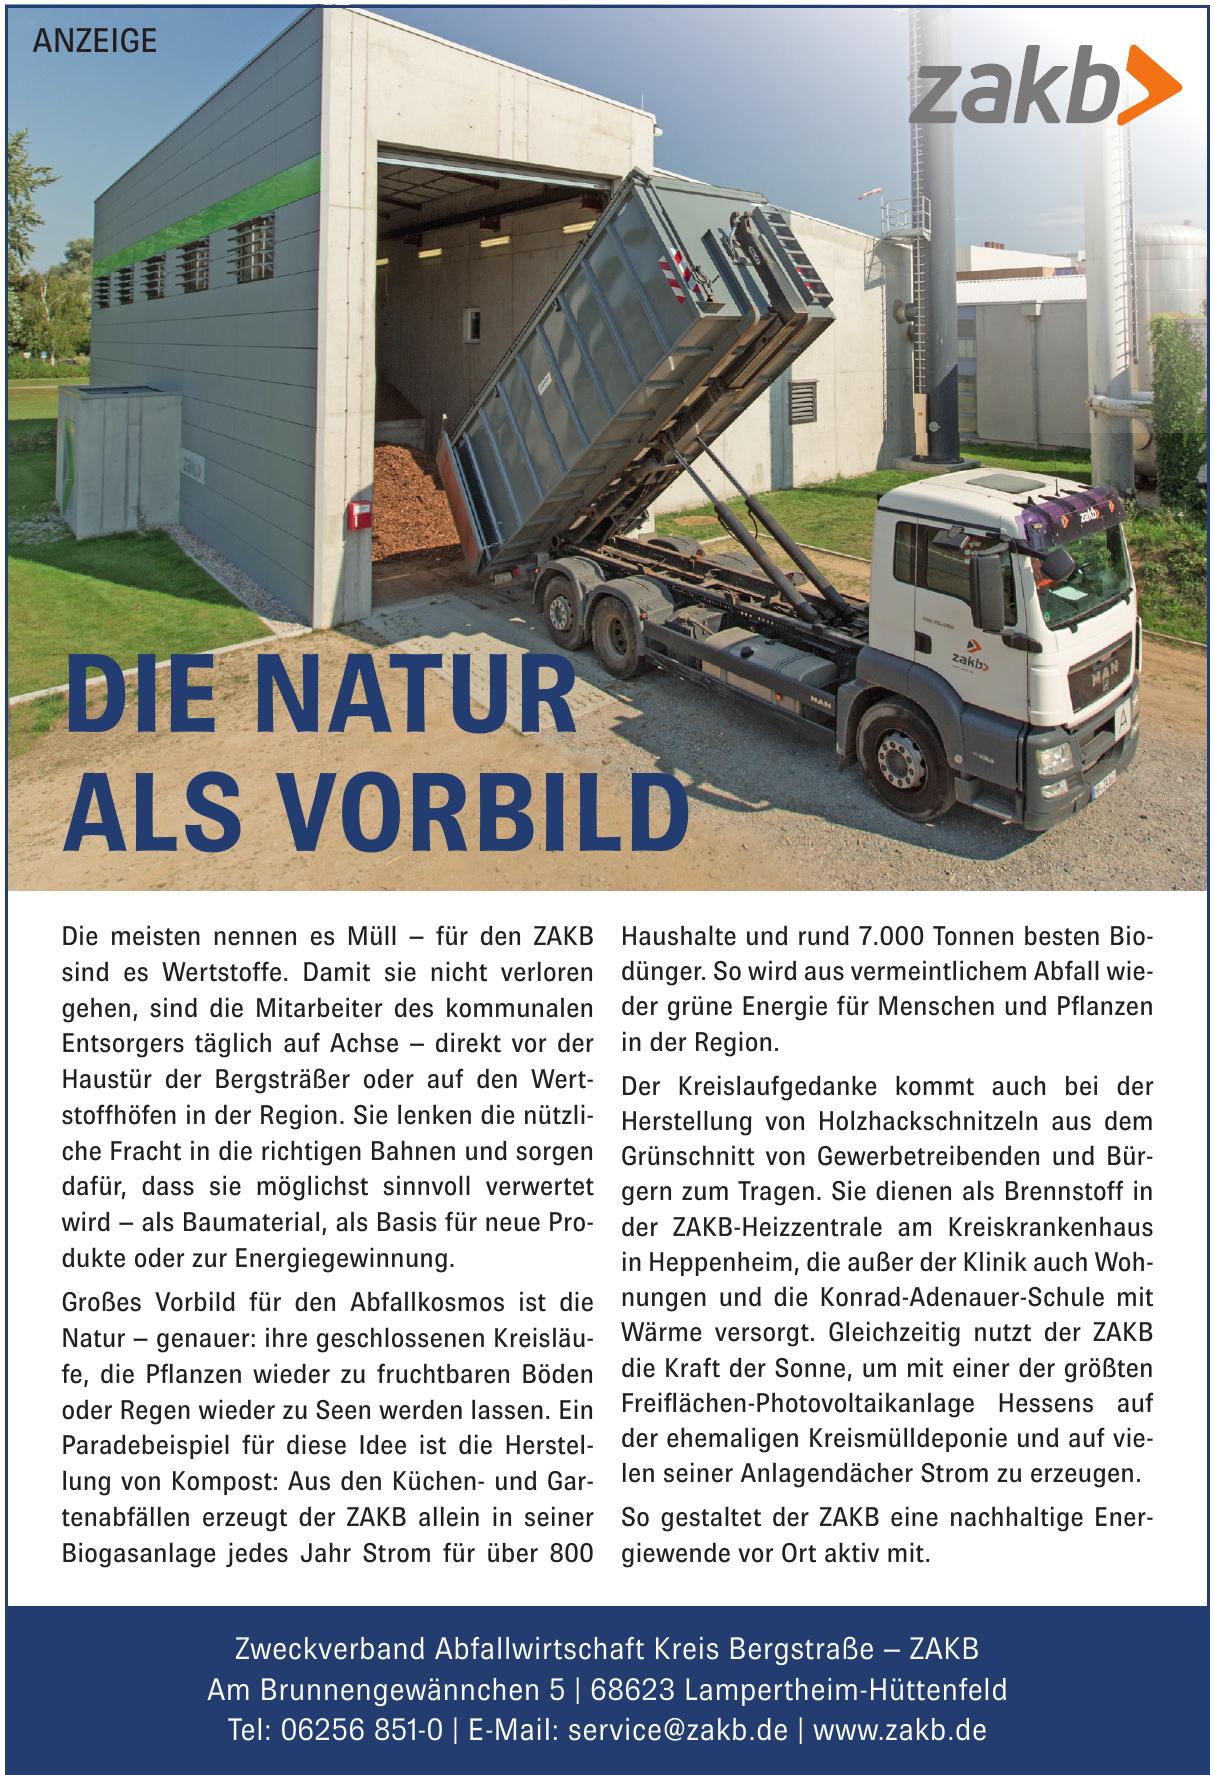 Zweckverband Abfallwirtschaft Kreis Bergstraße – ZAKB